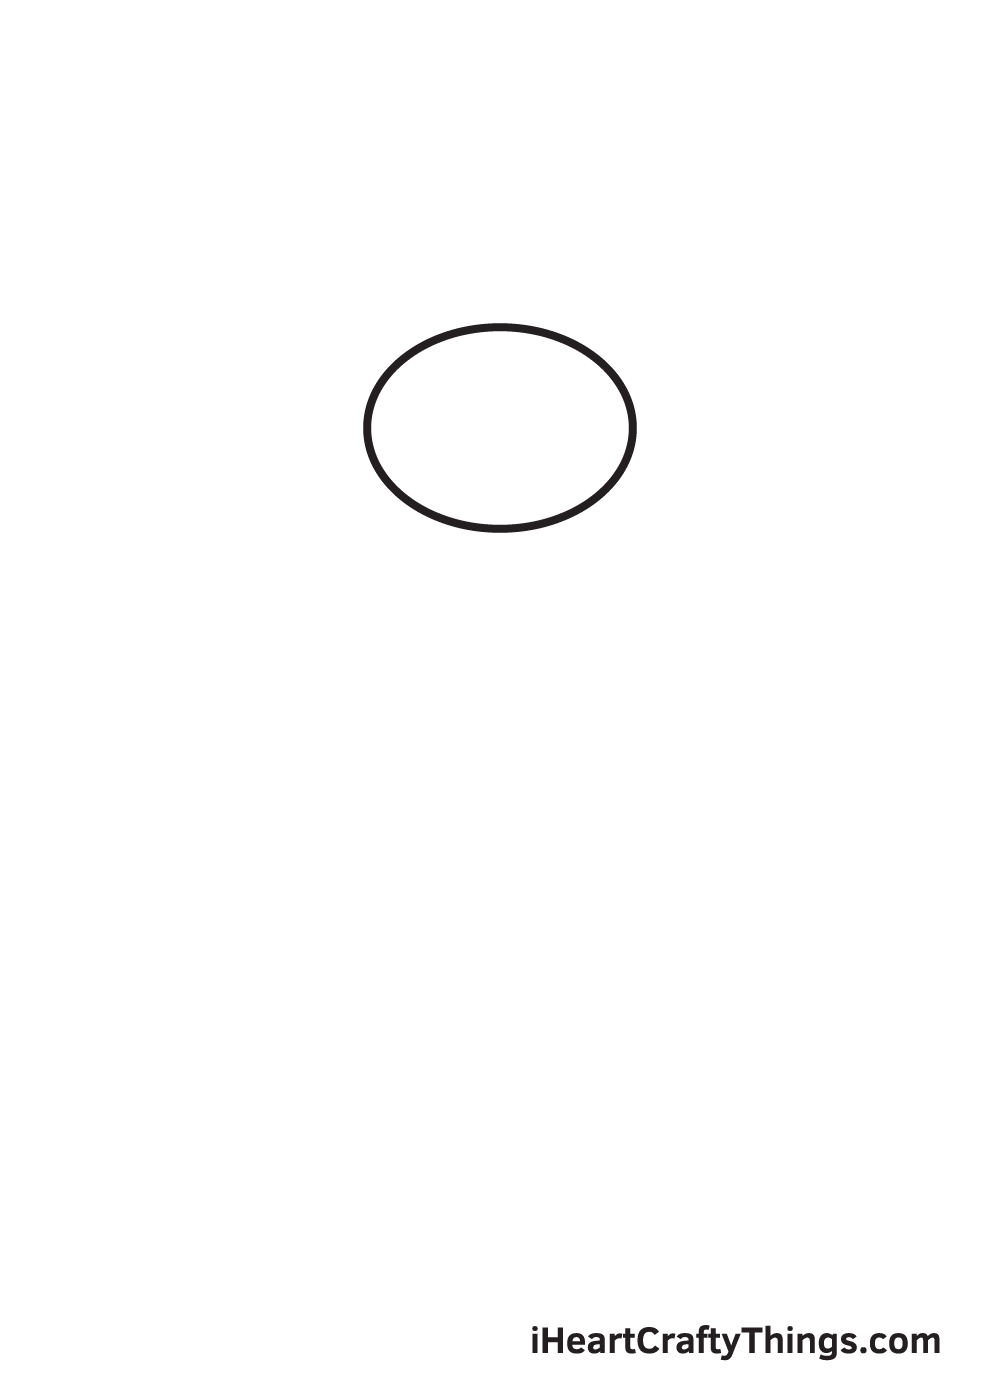 gorilla drawing - step 1